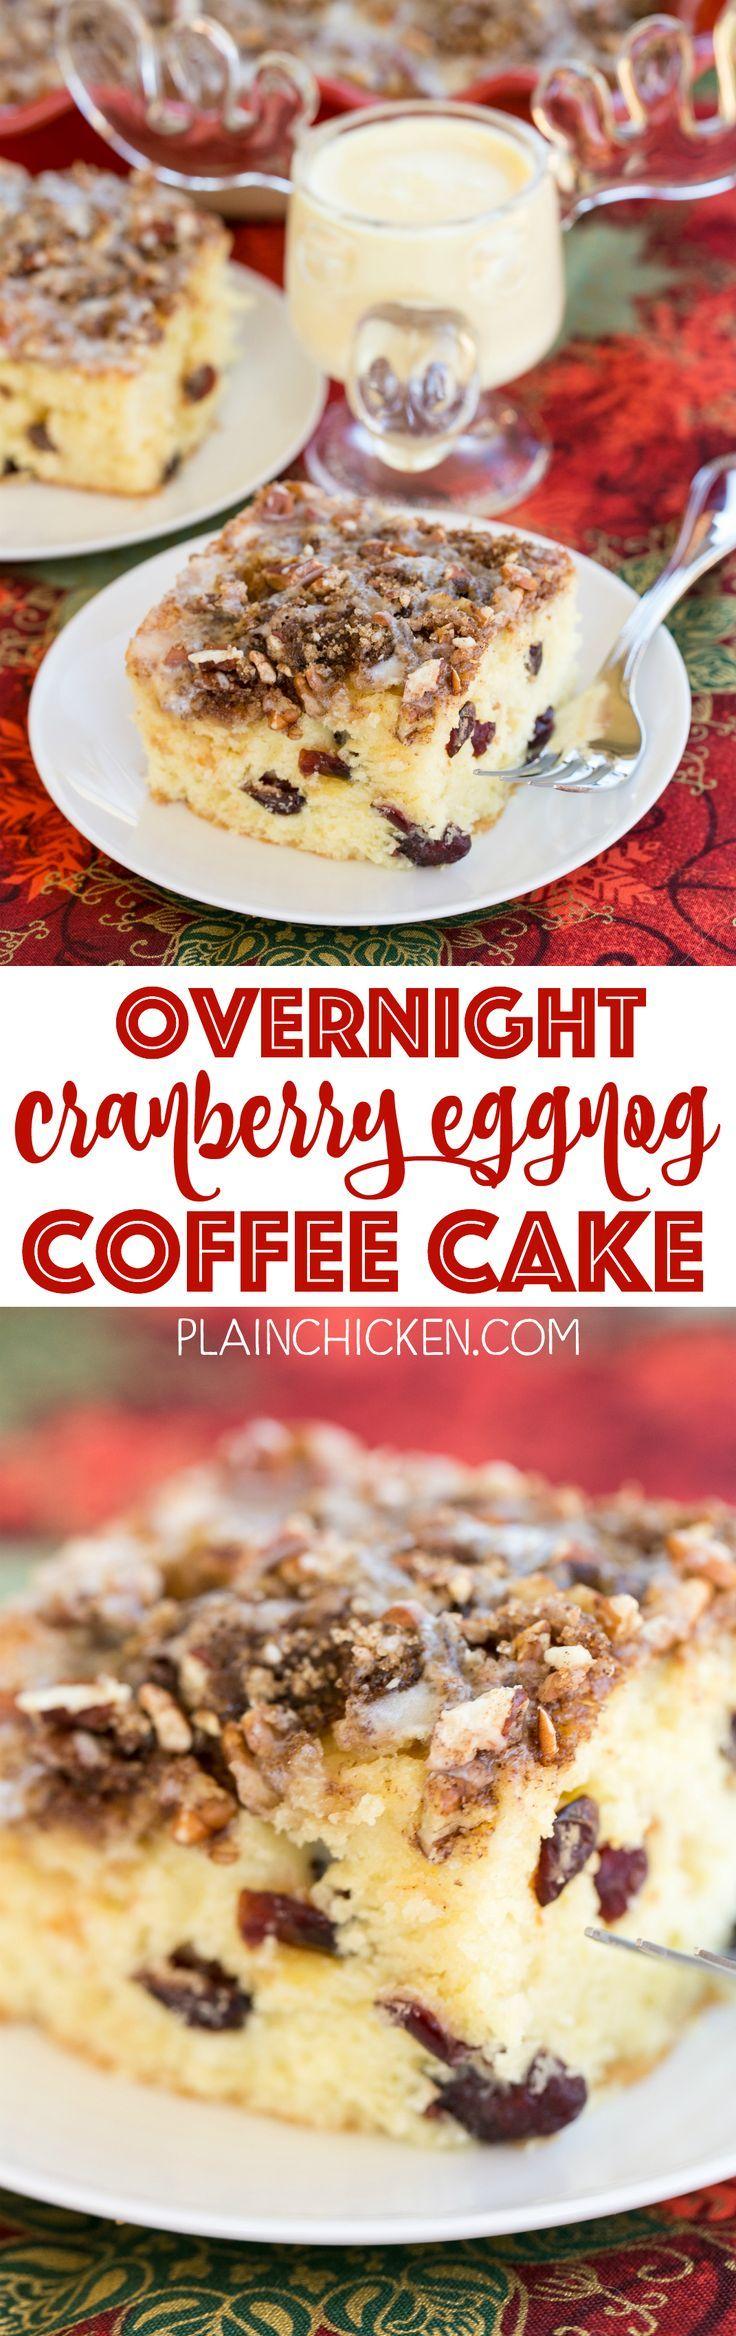 Overnight Cranberry Eggnog Coffee Cake - refrigerate batter overnight ...